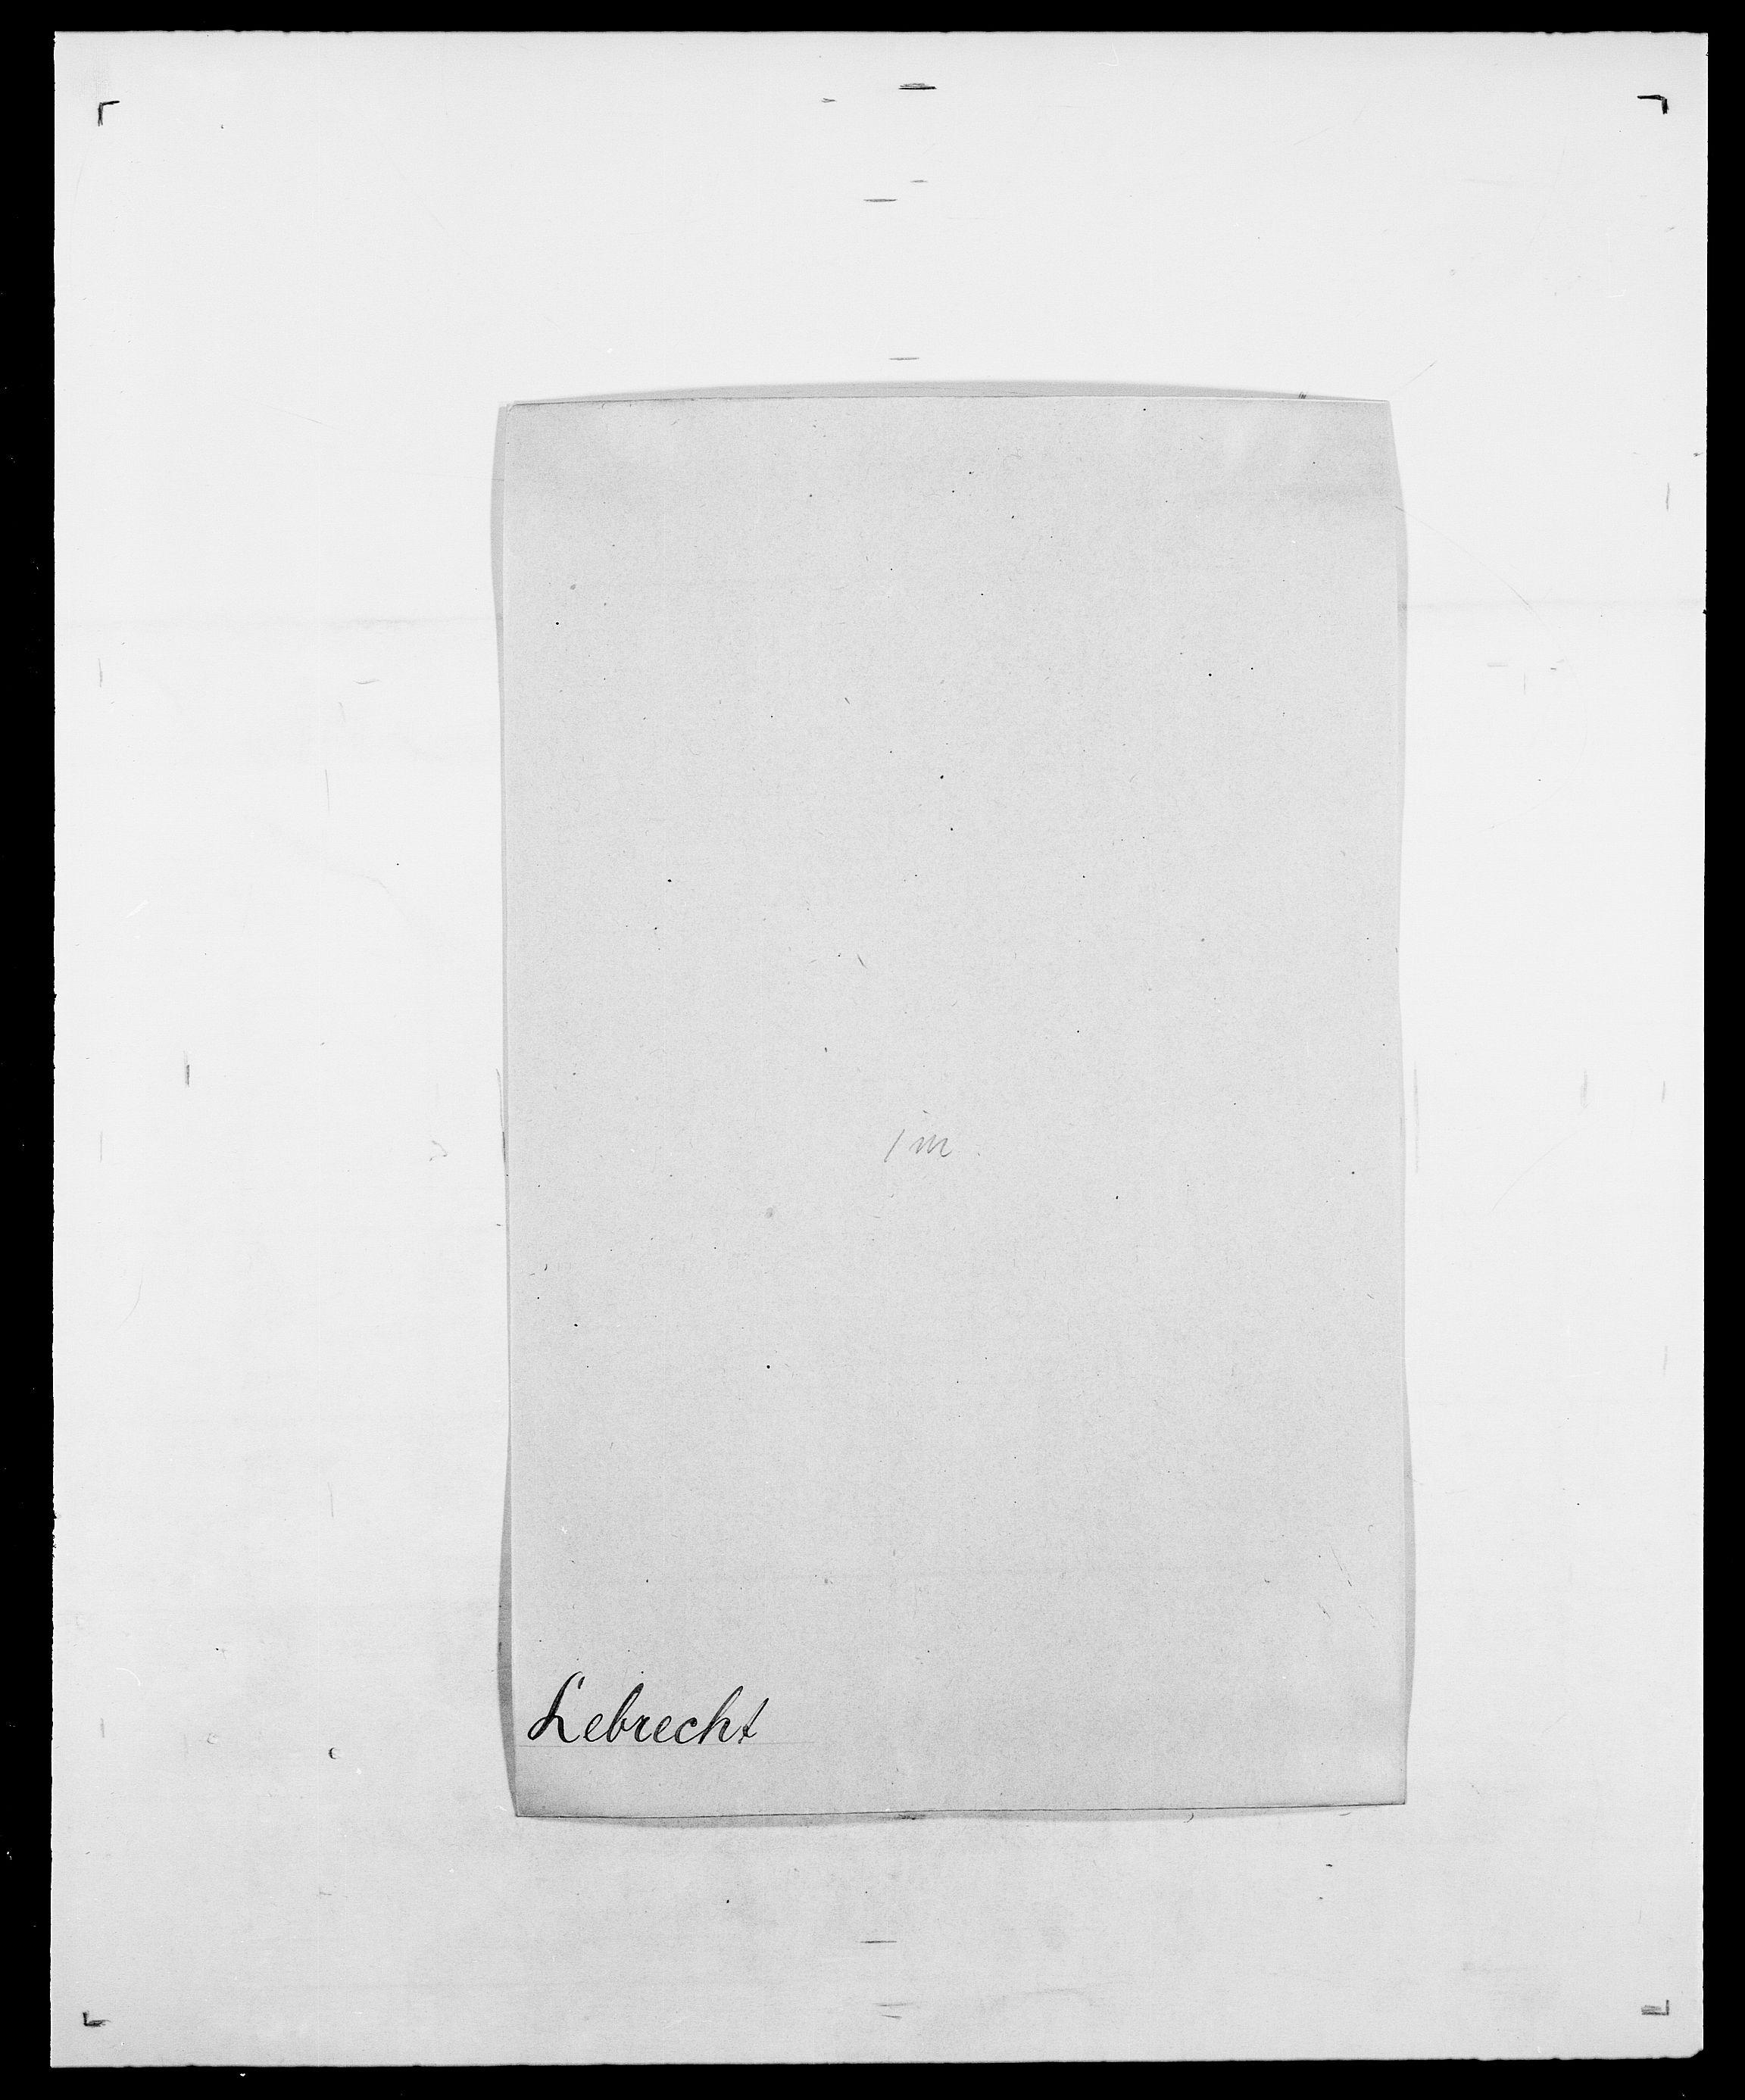 SAO, Delgobe, Charles Antoine - samling, D/Da/L0023: Lau - Lirvyn, s. 50